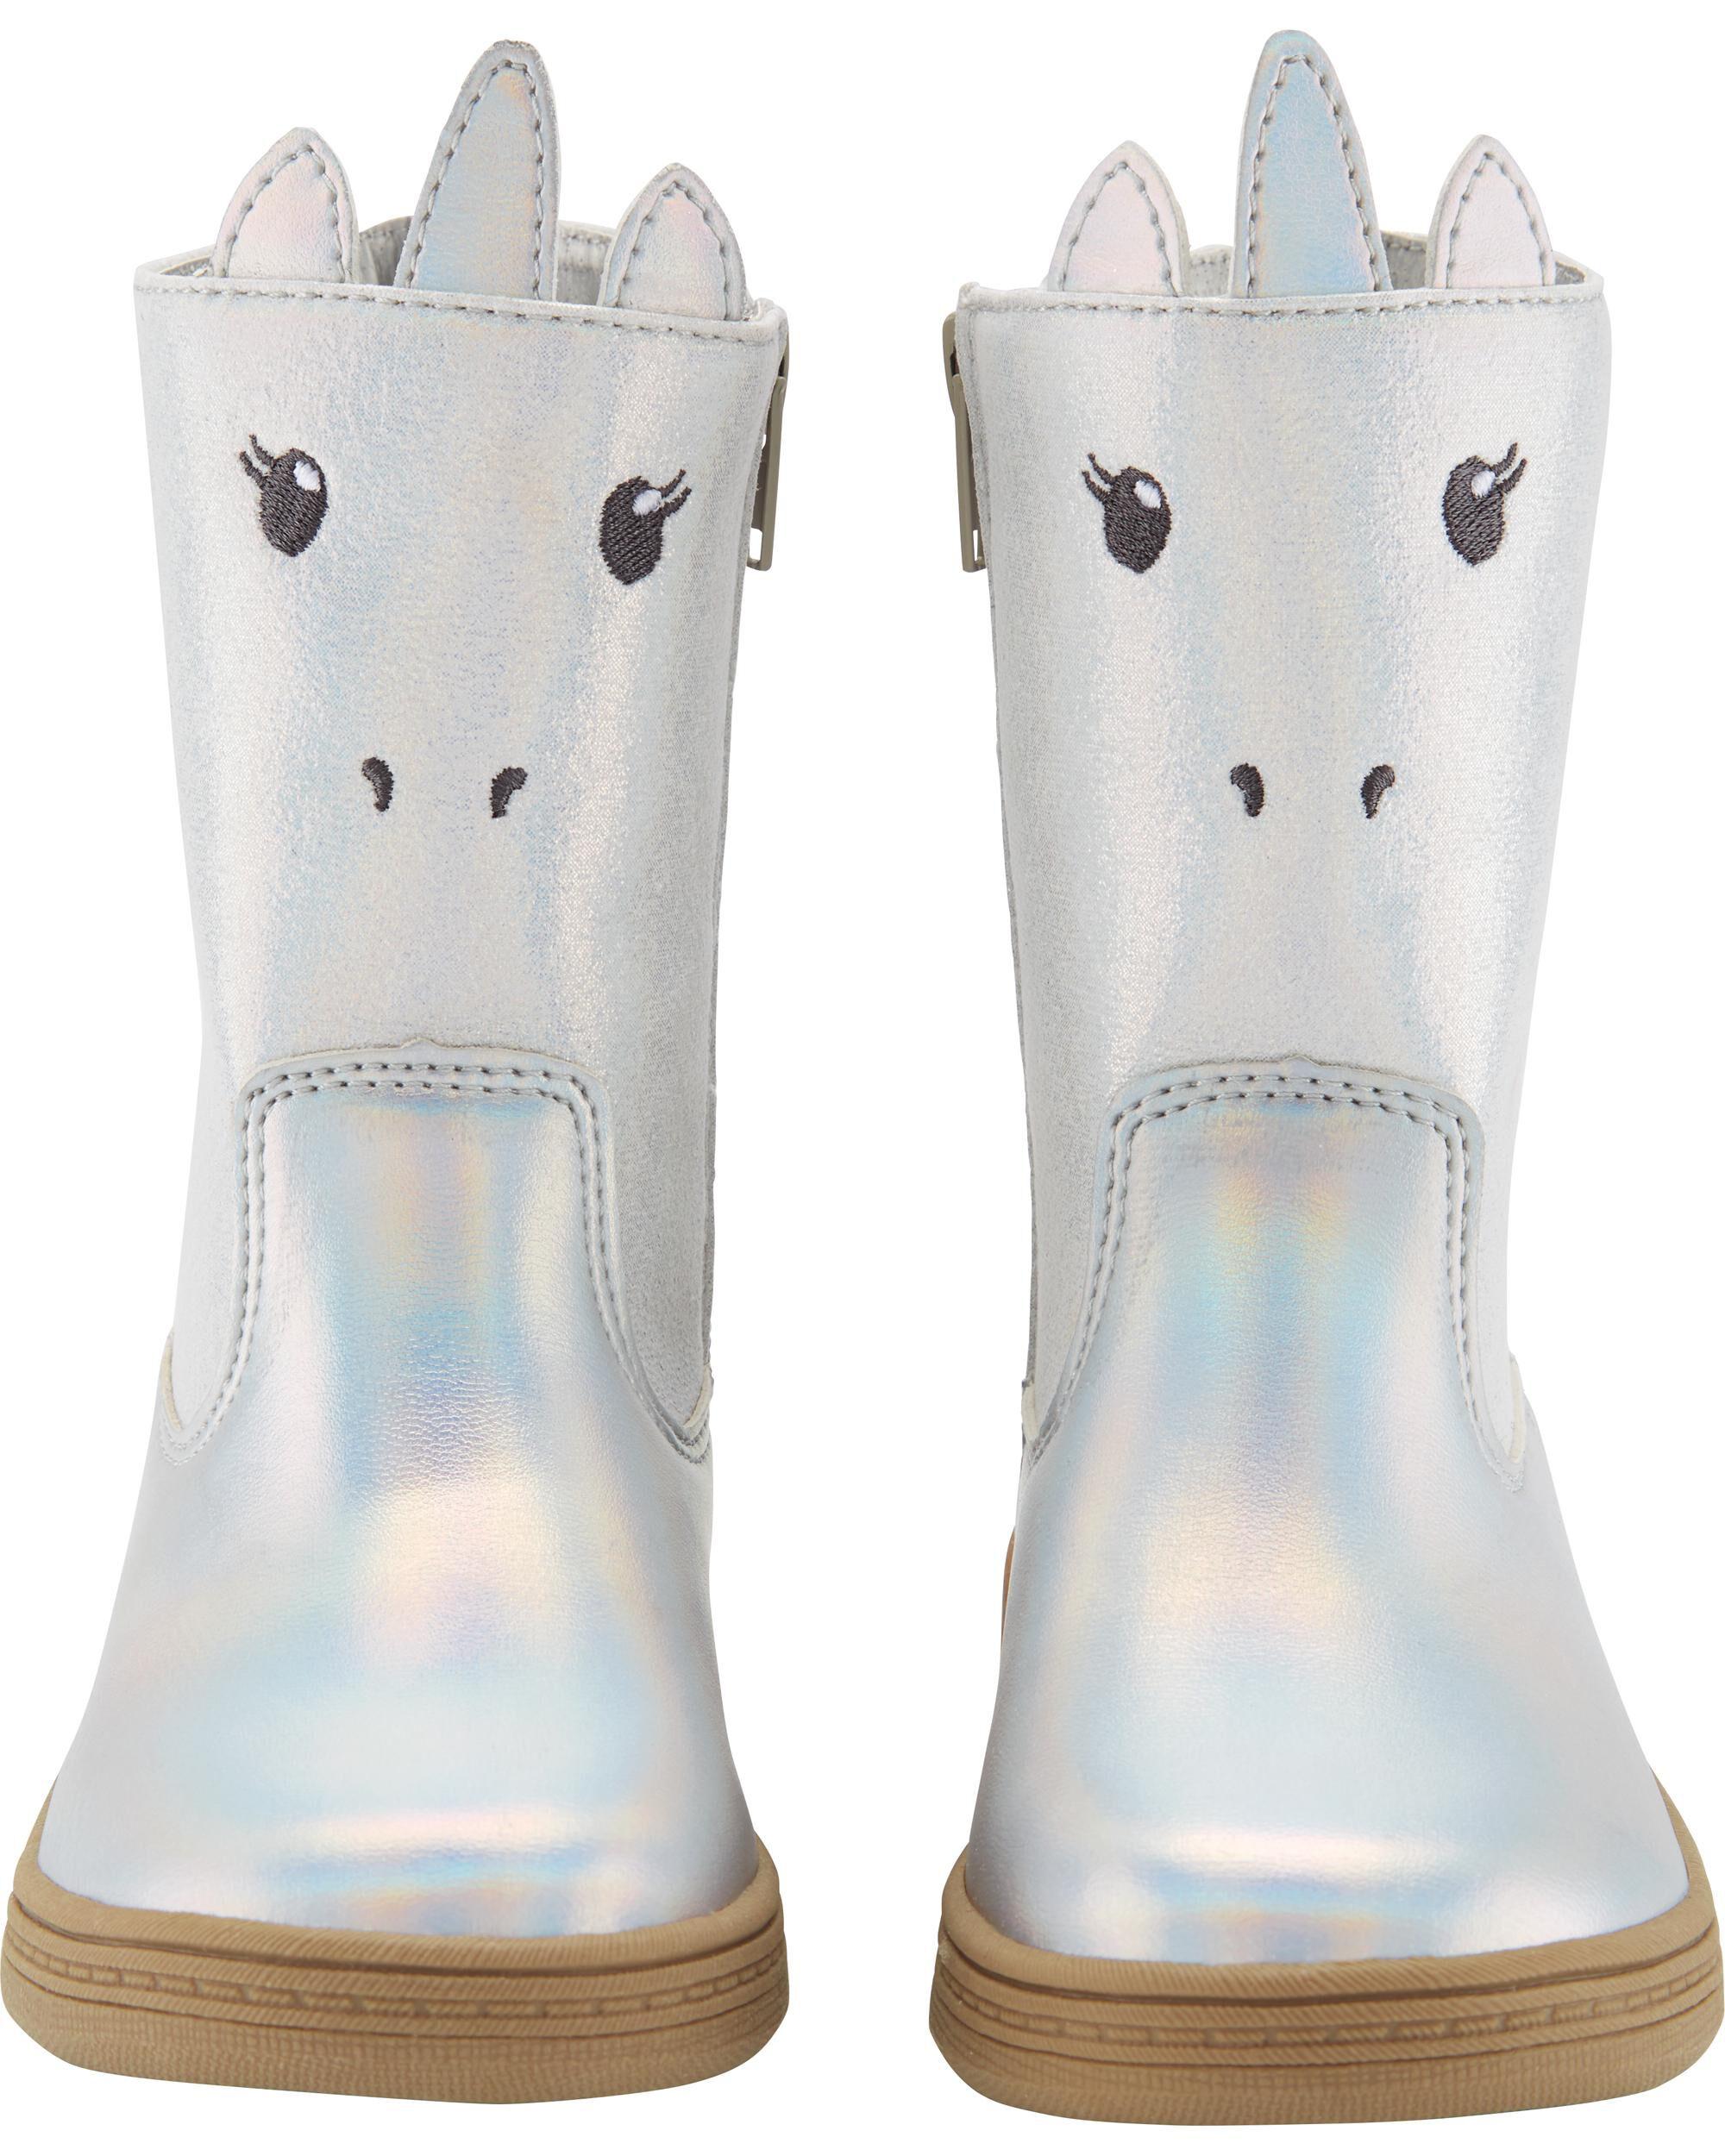 Carter's Unicorn Boots | oshkosh.com